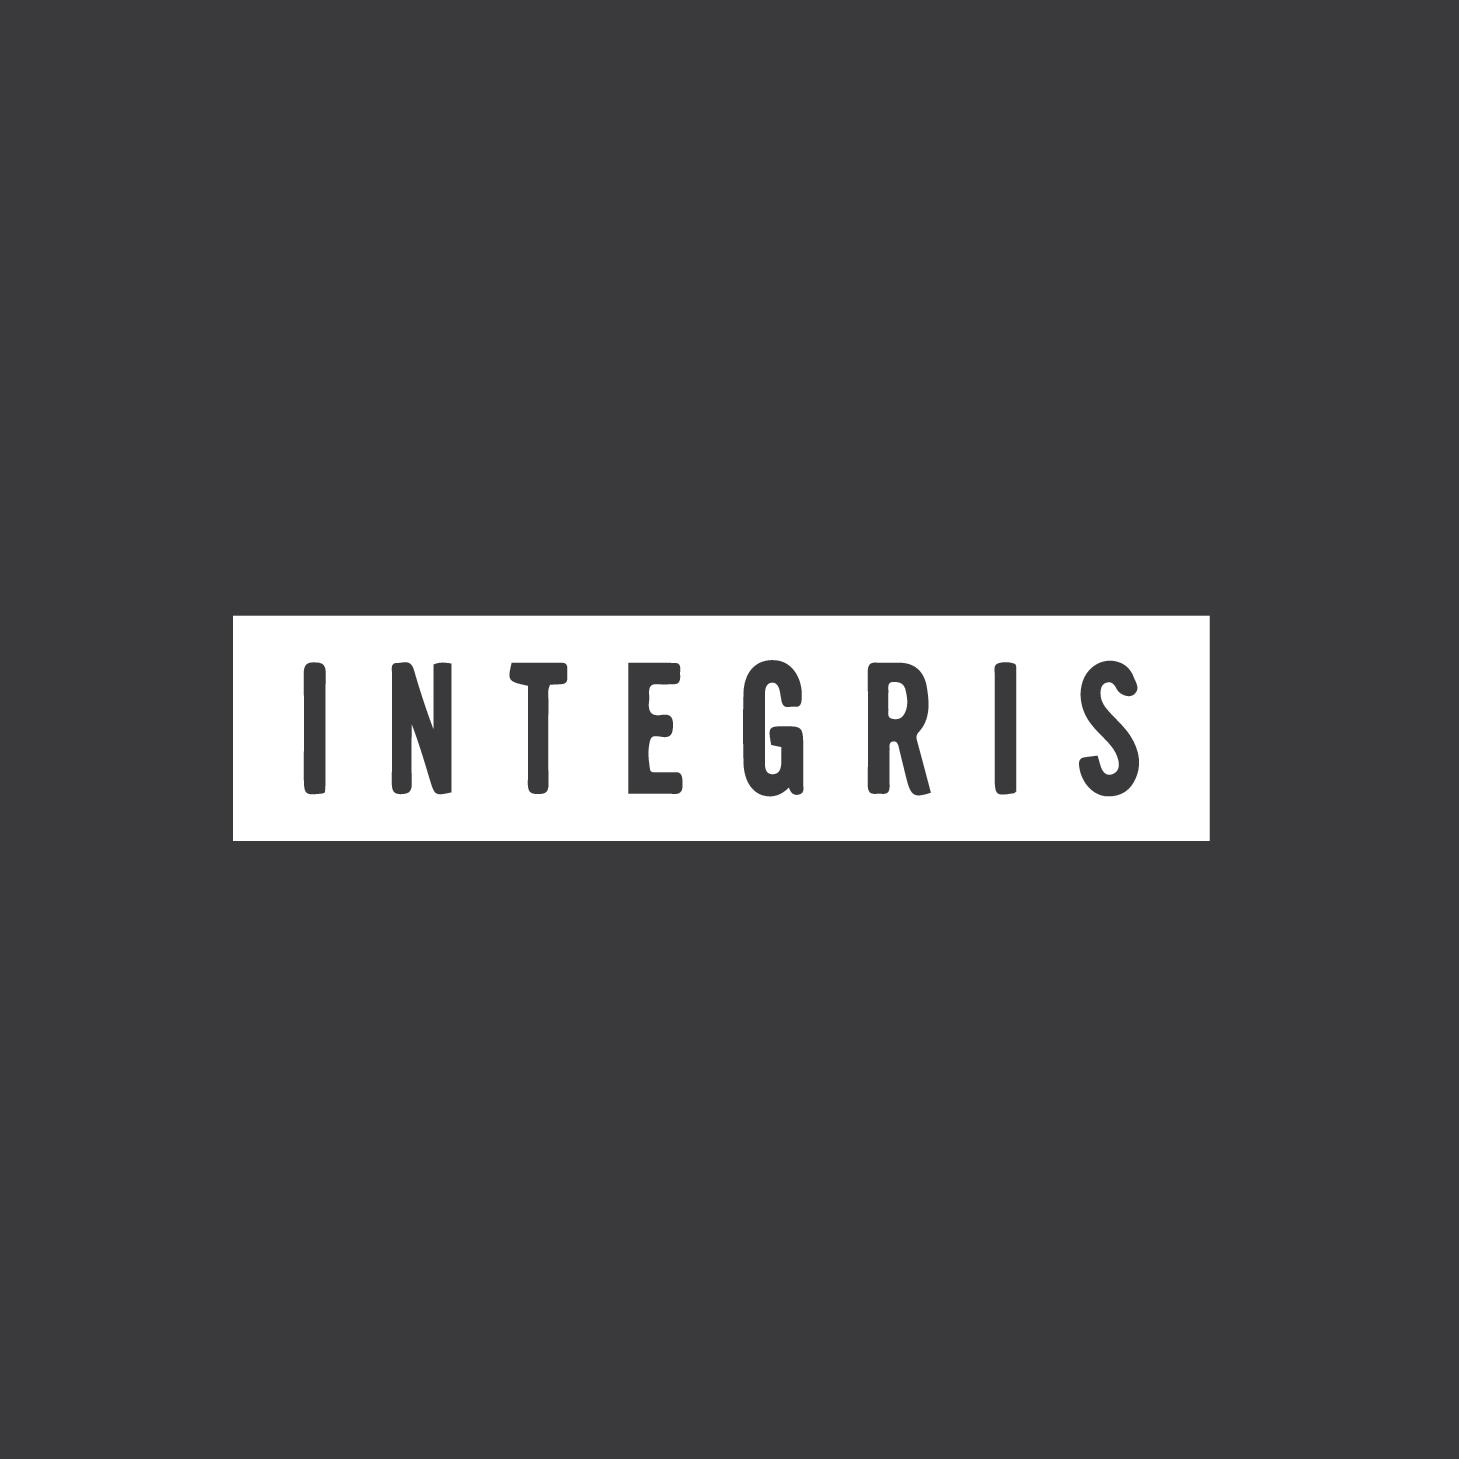 Integris.png